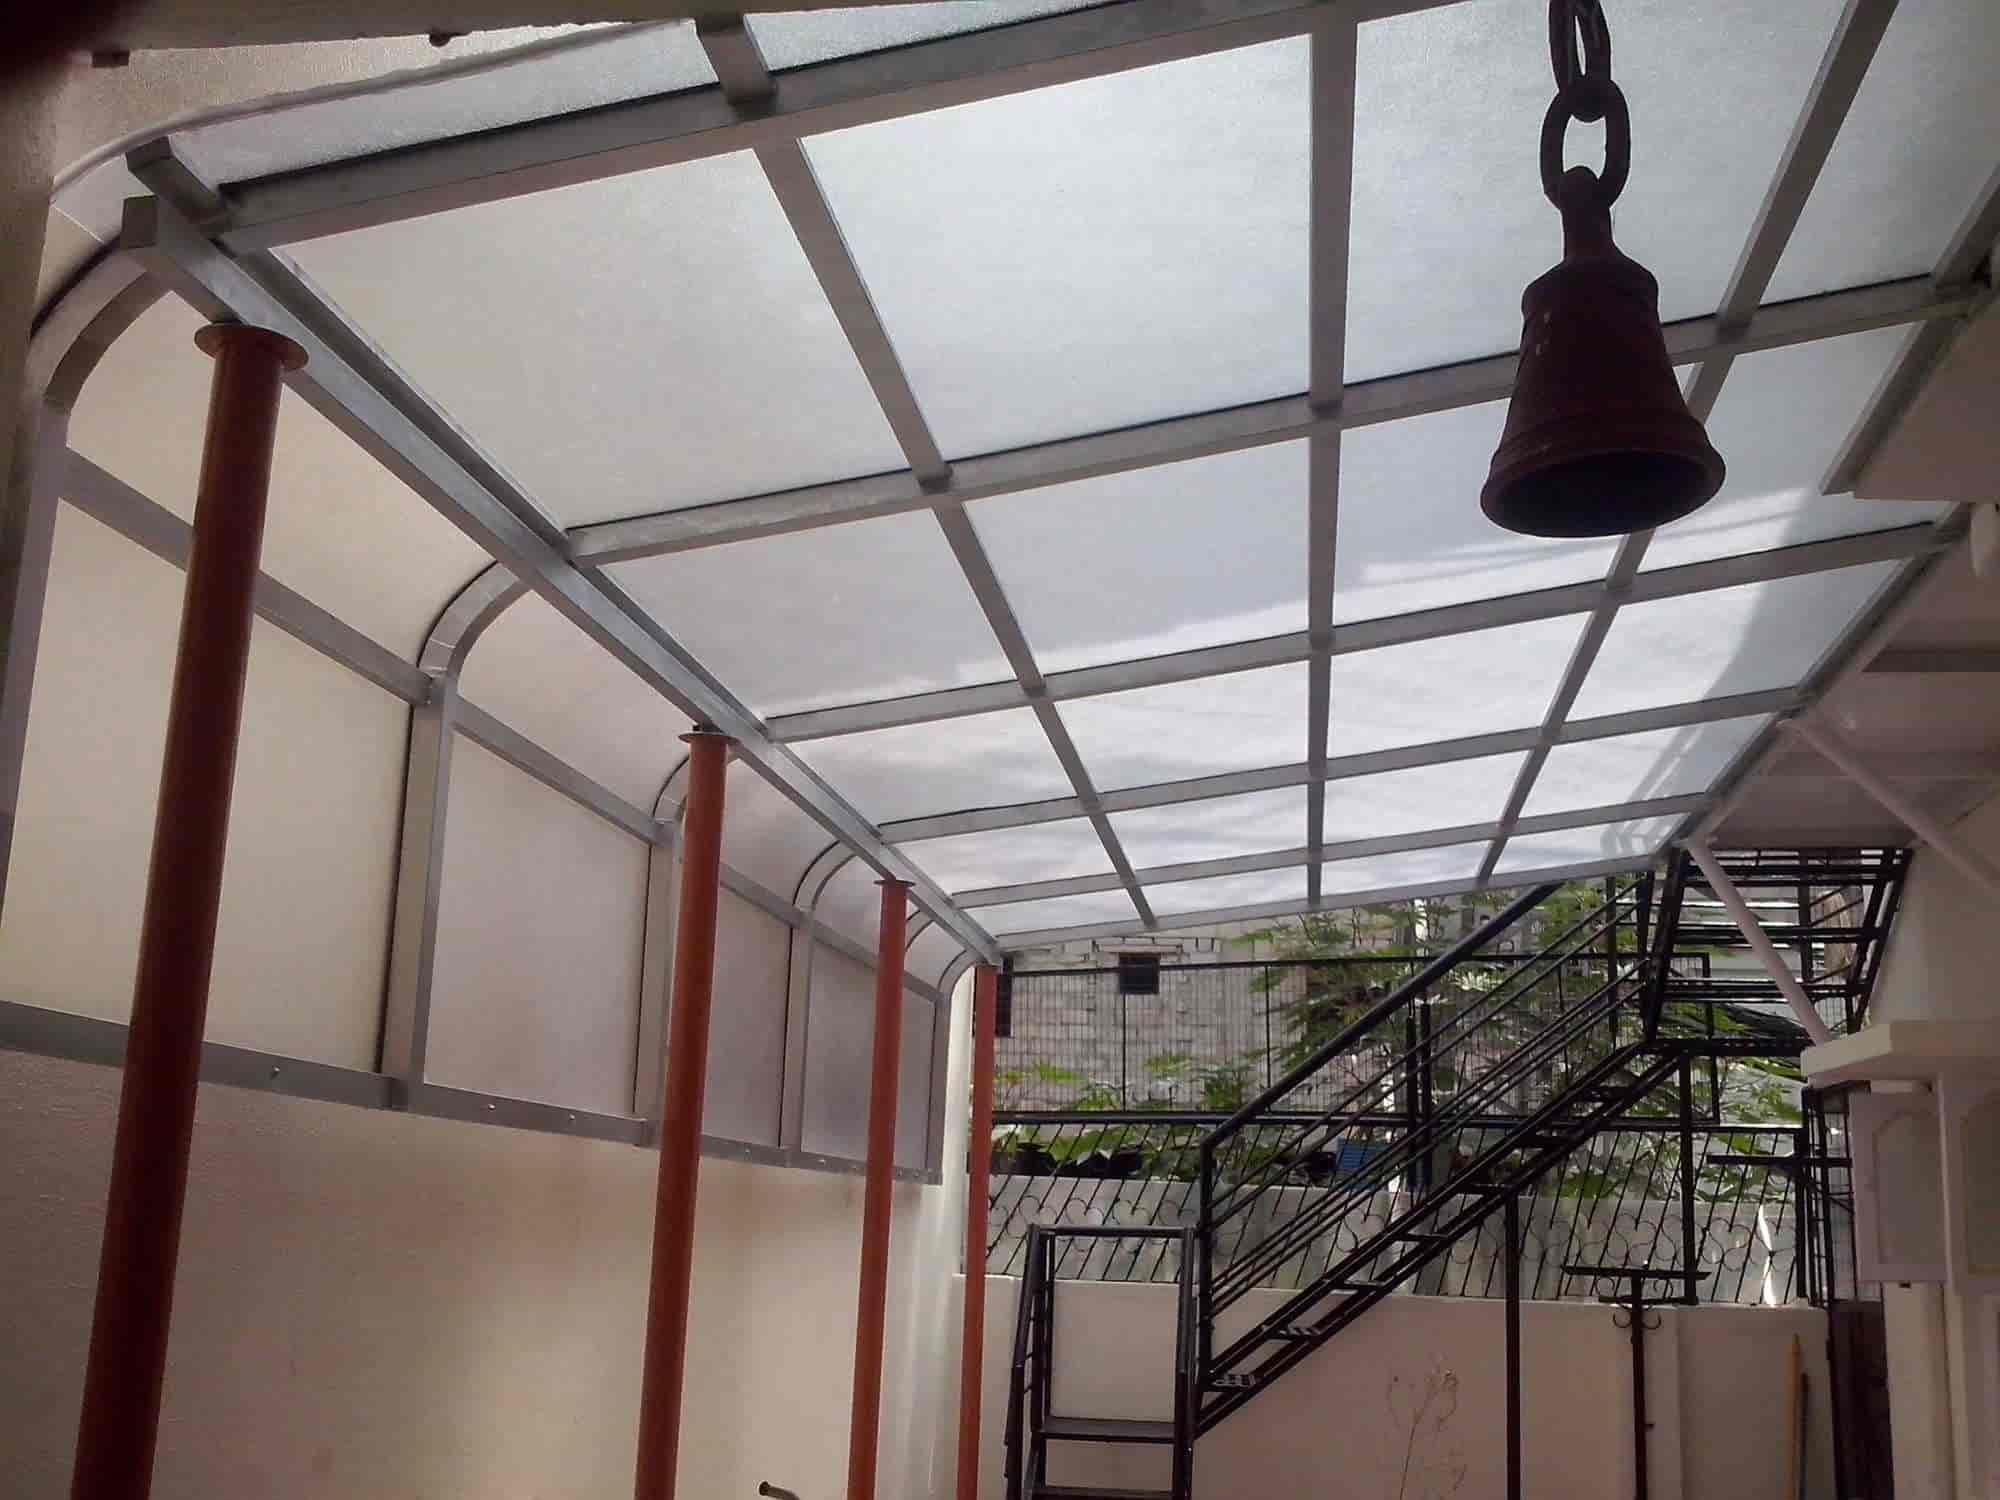 Akash Roofing Solutions Photos, Kalyan Nagar, Udupi- Pictures